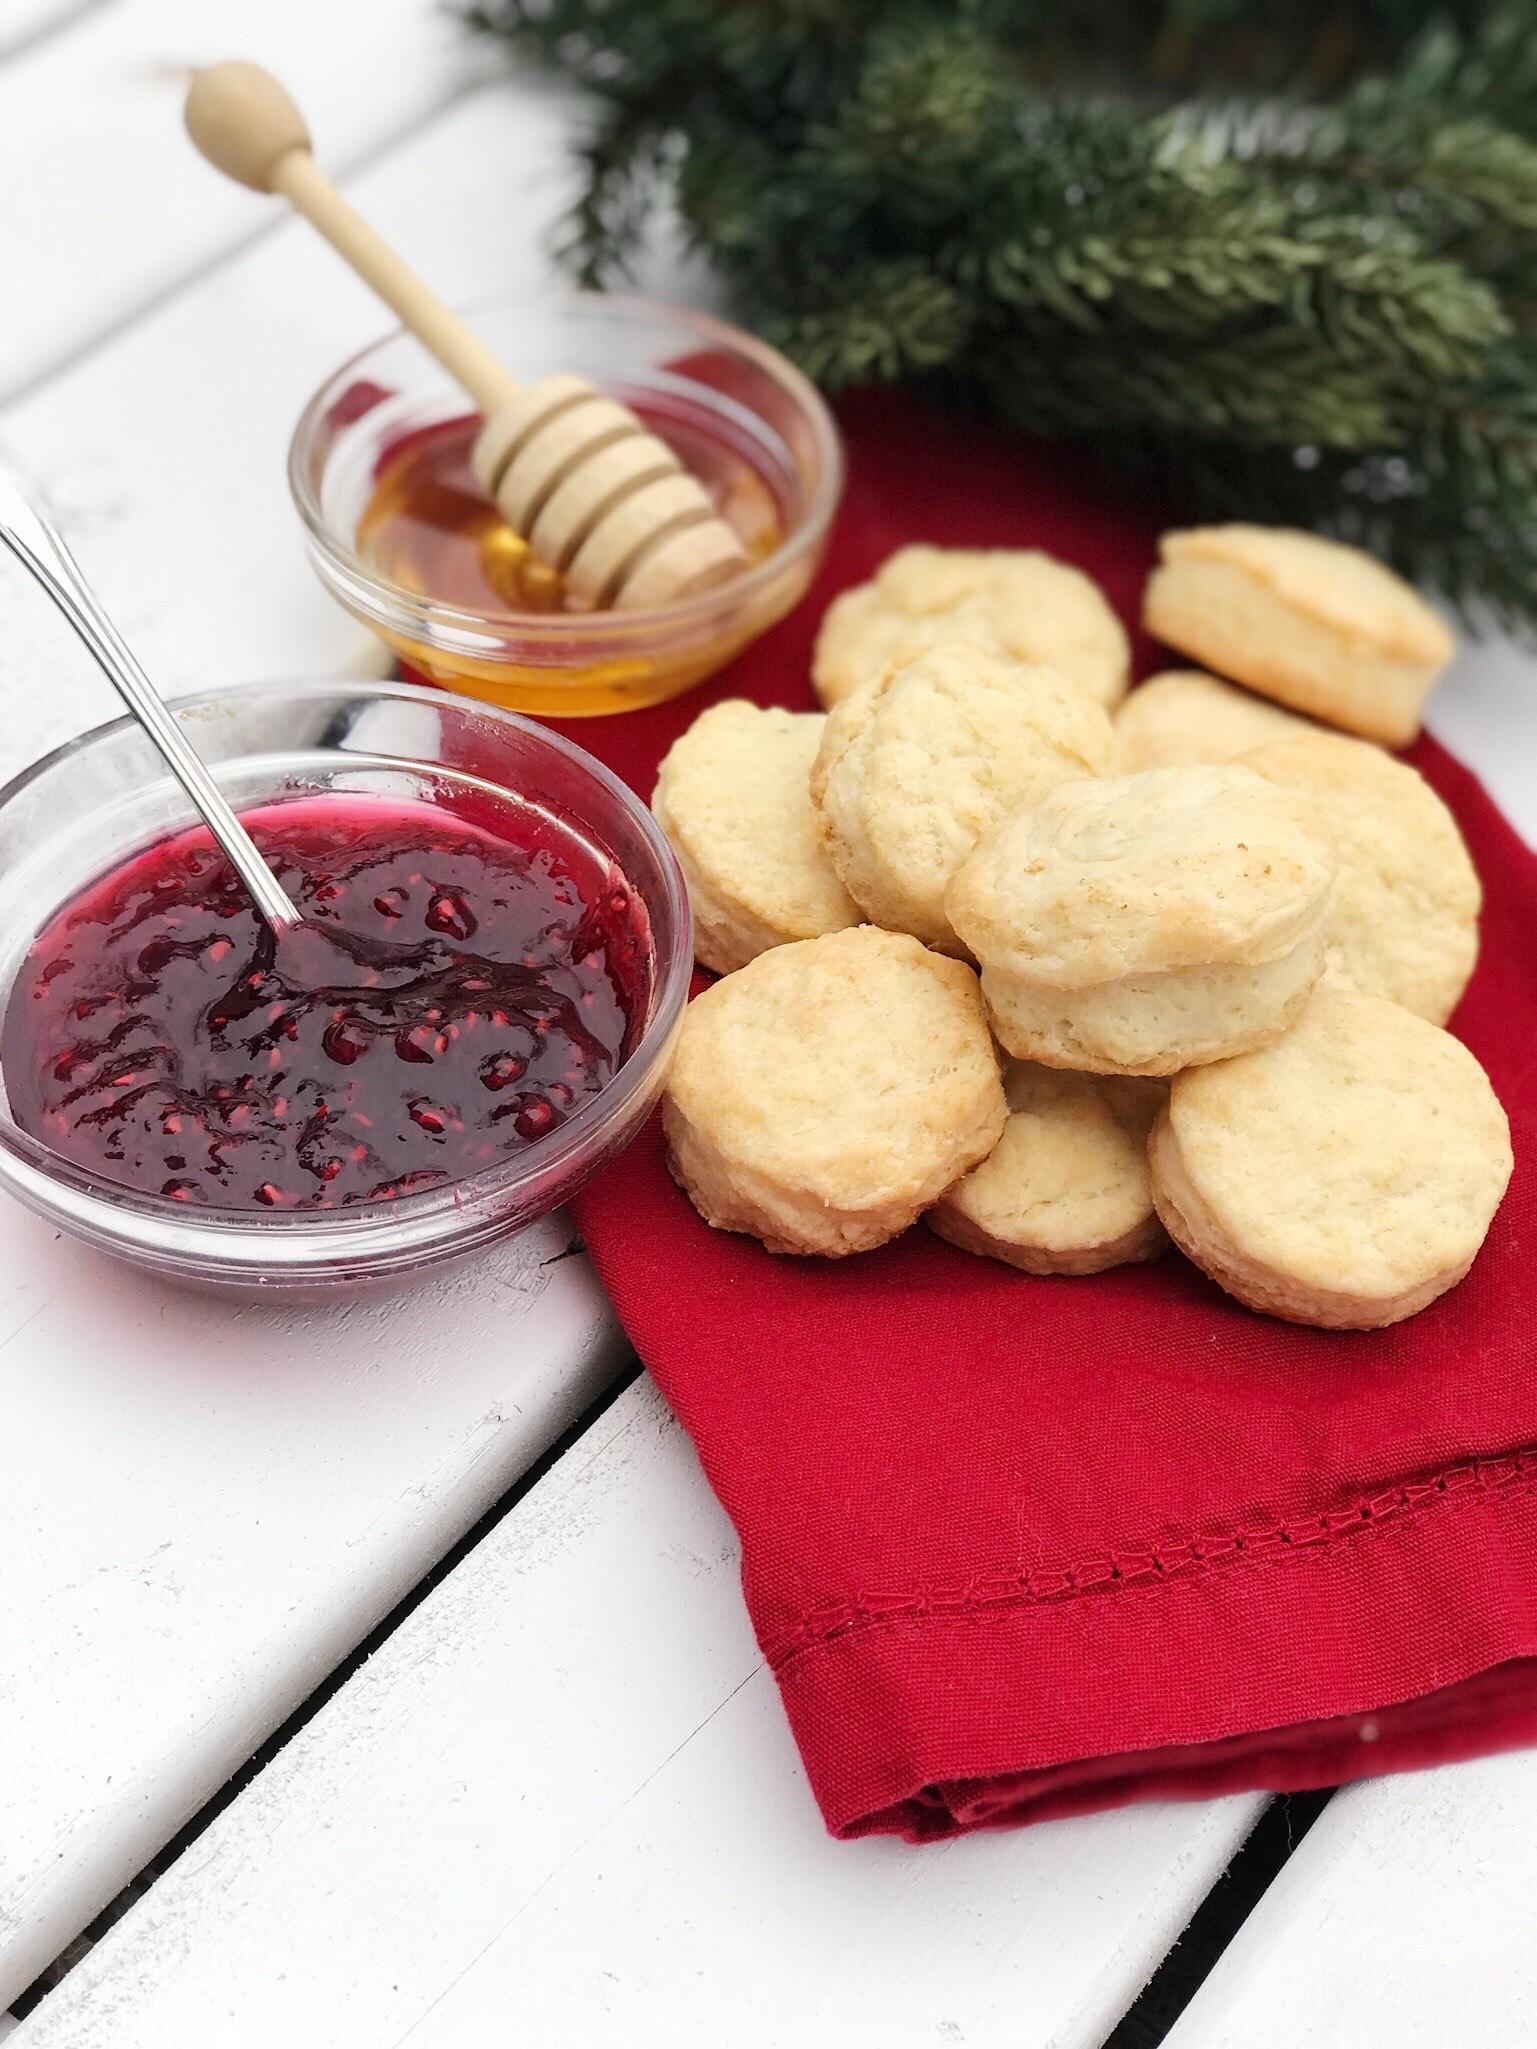 CKT Biscuits